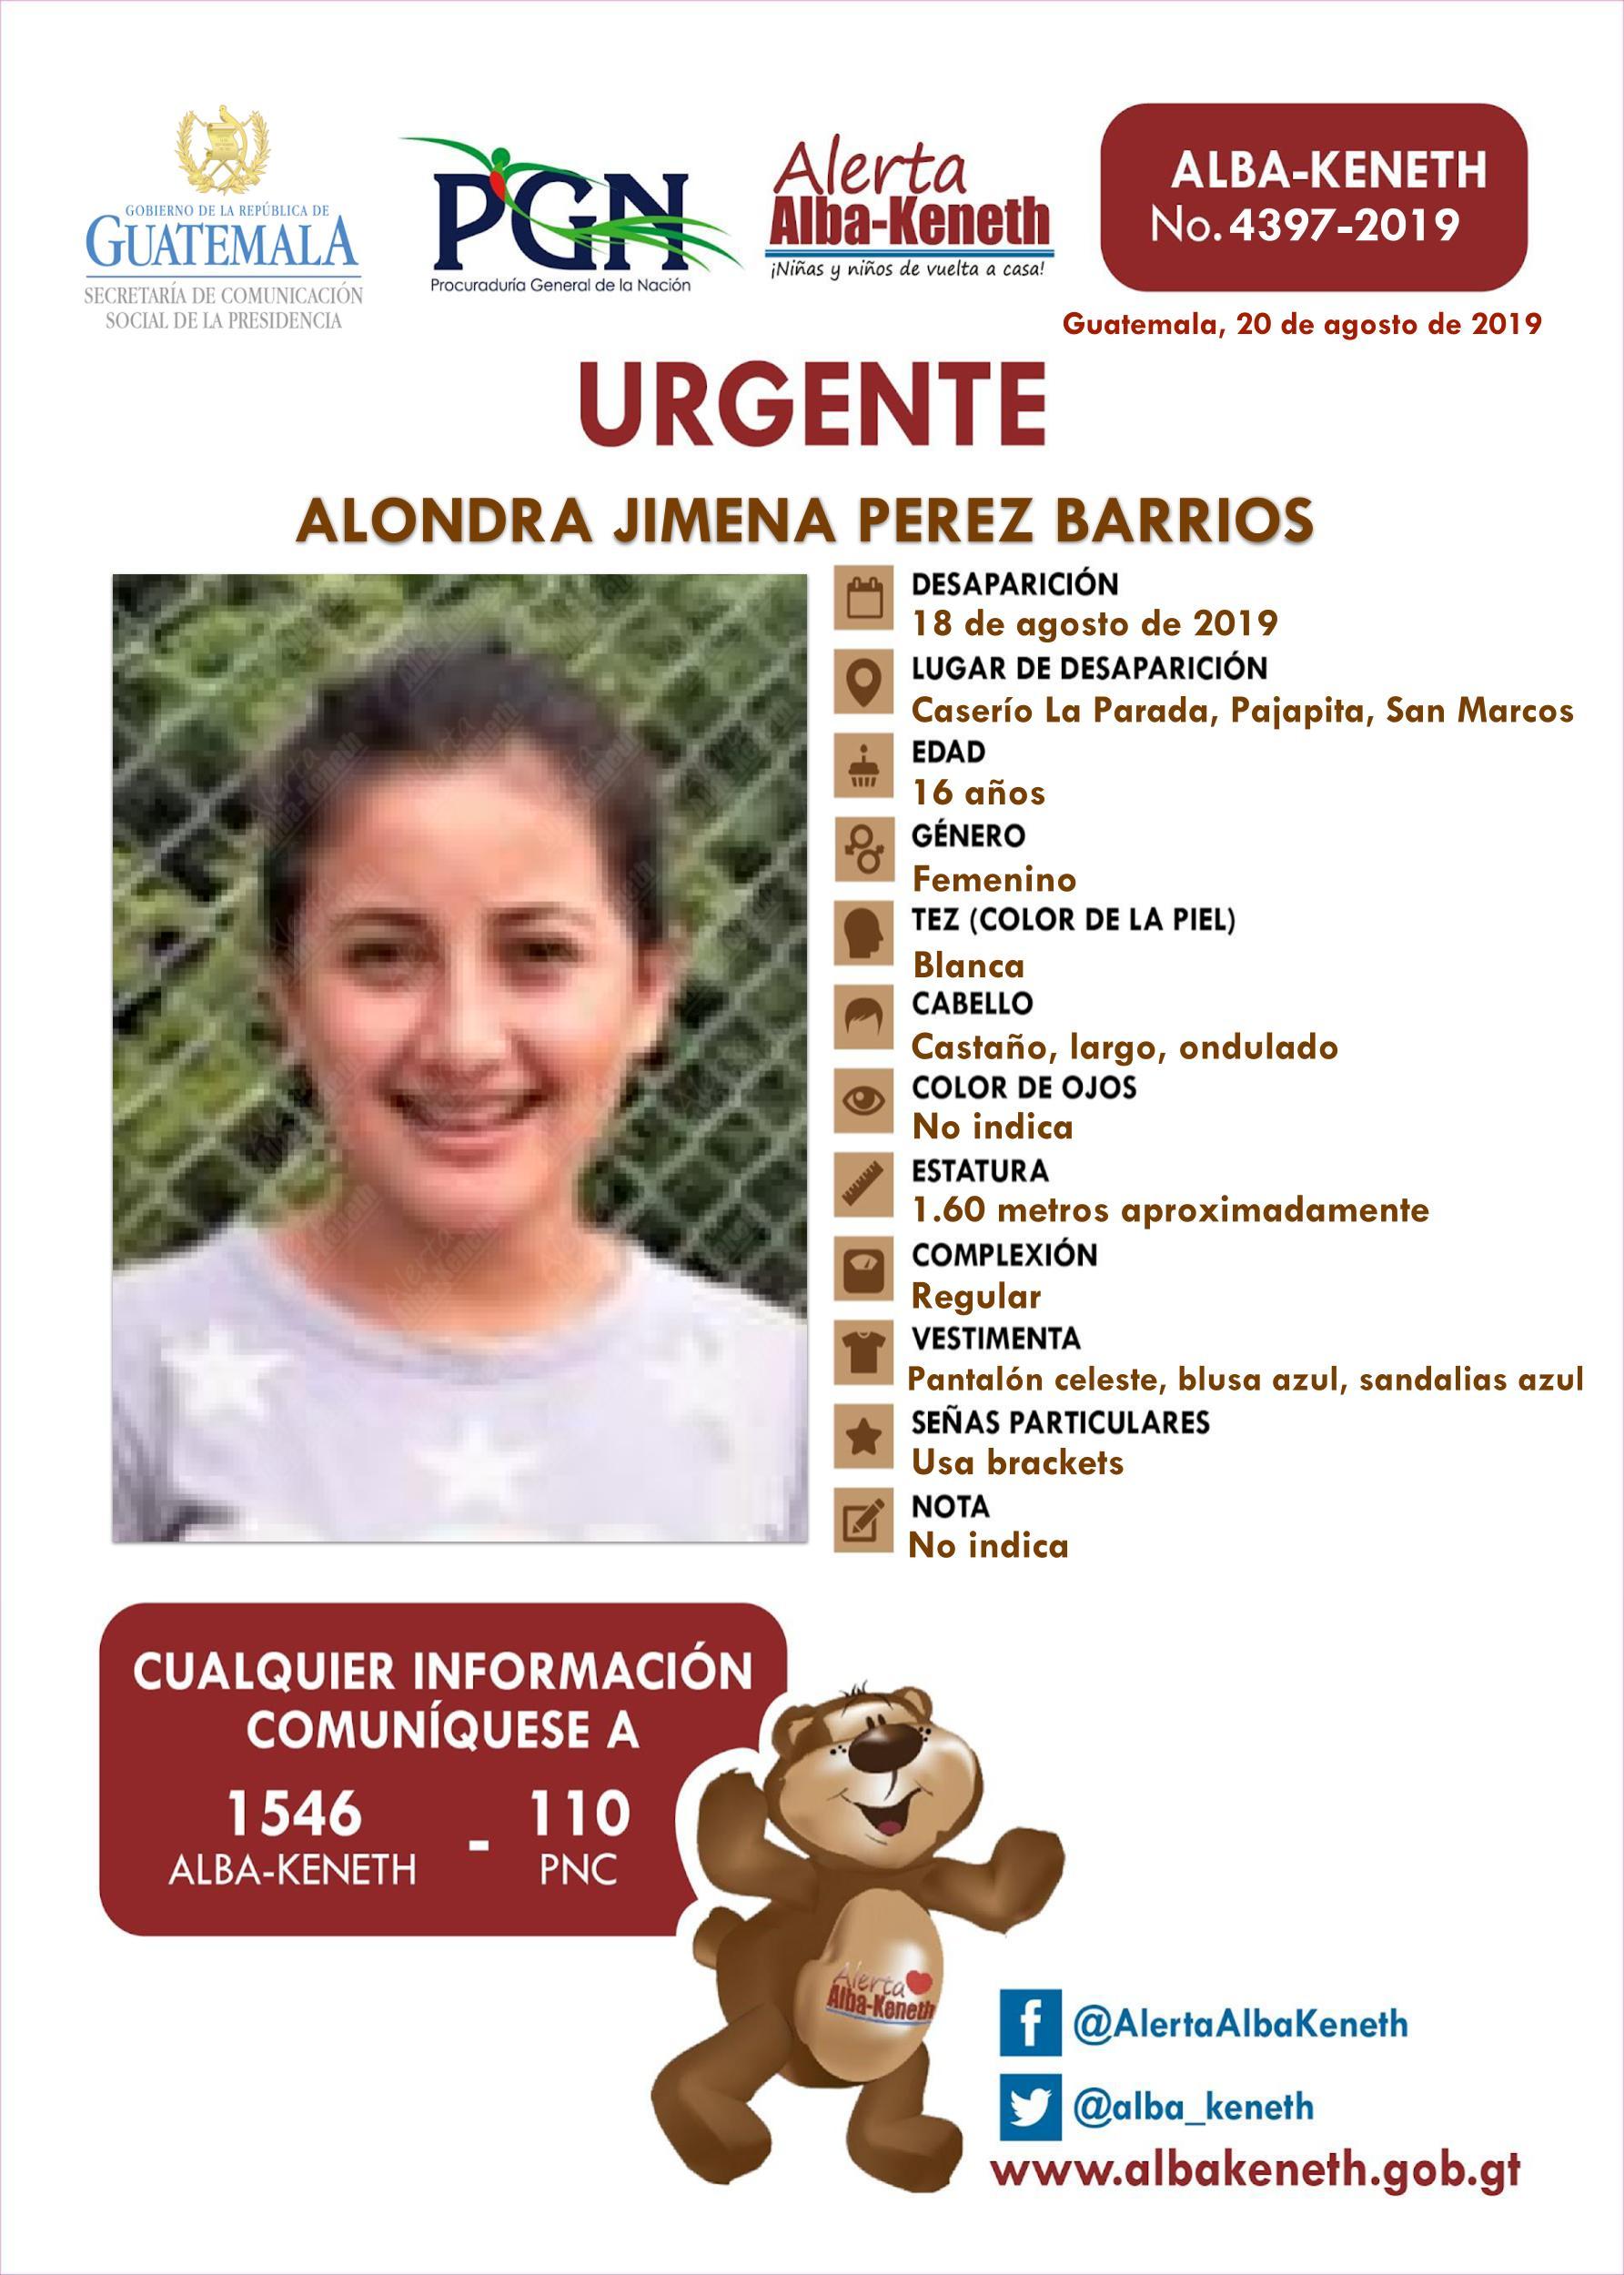 Alondra Jimena Perez Barrios